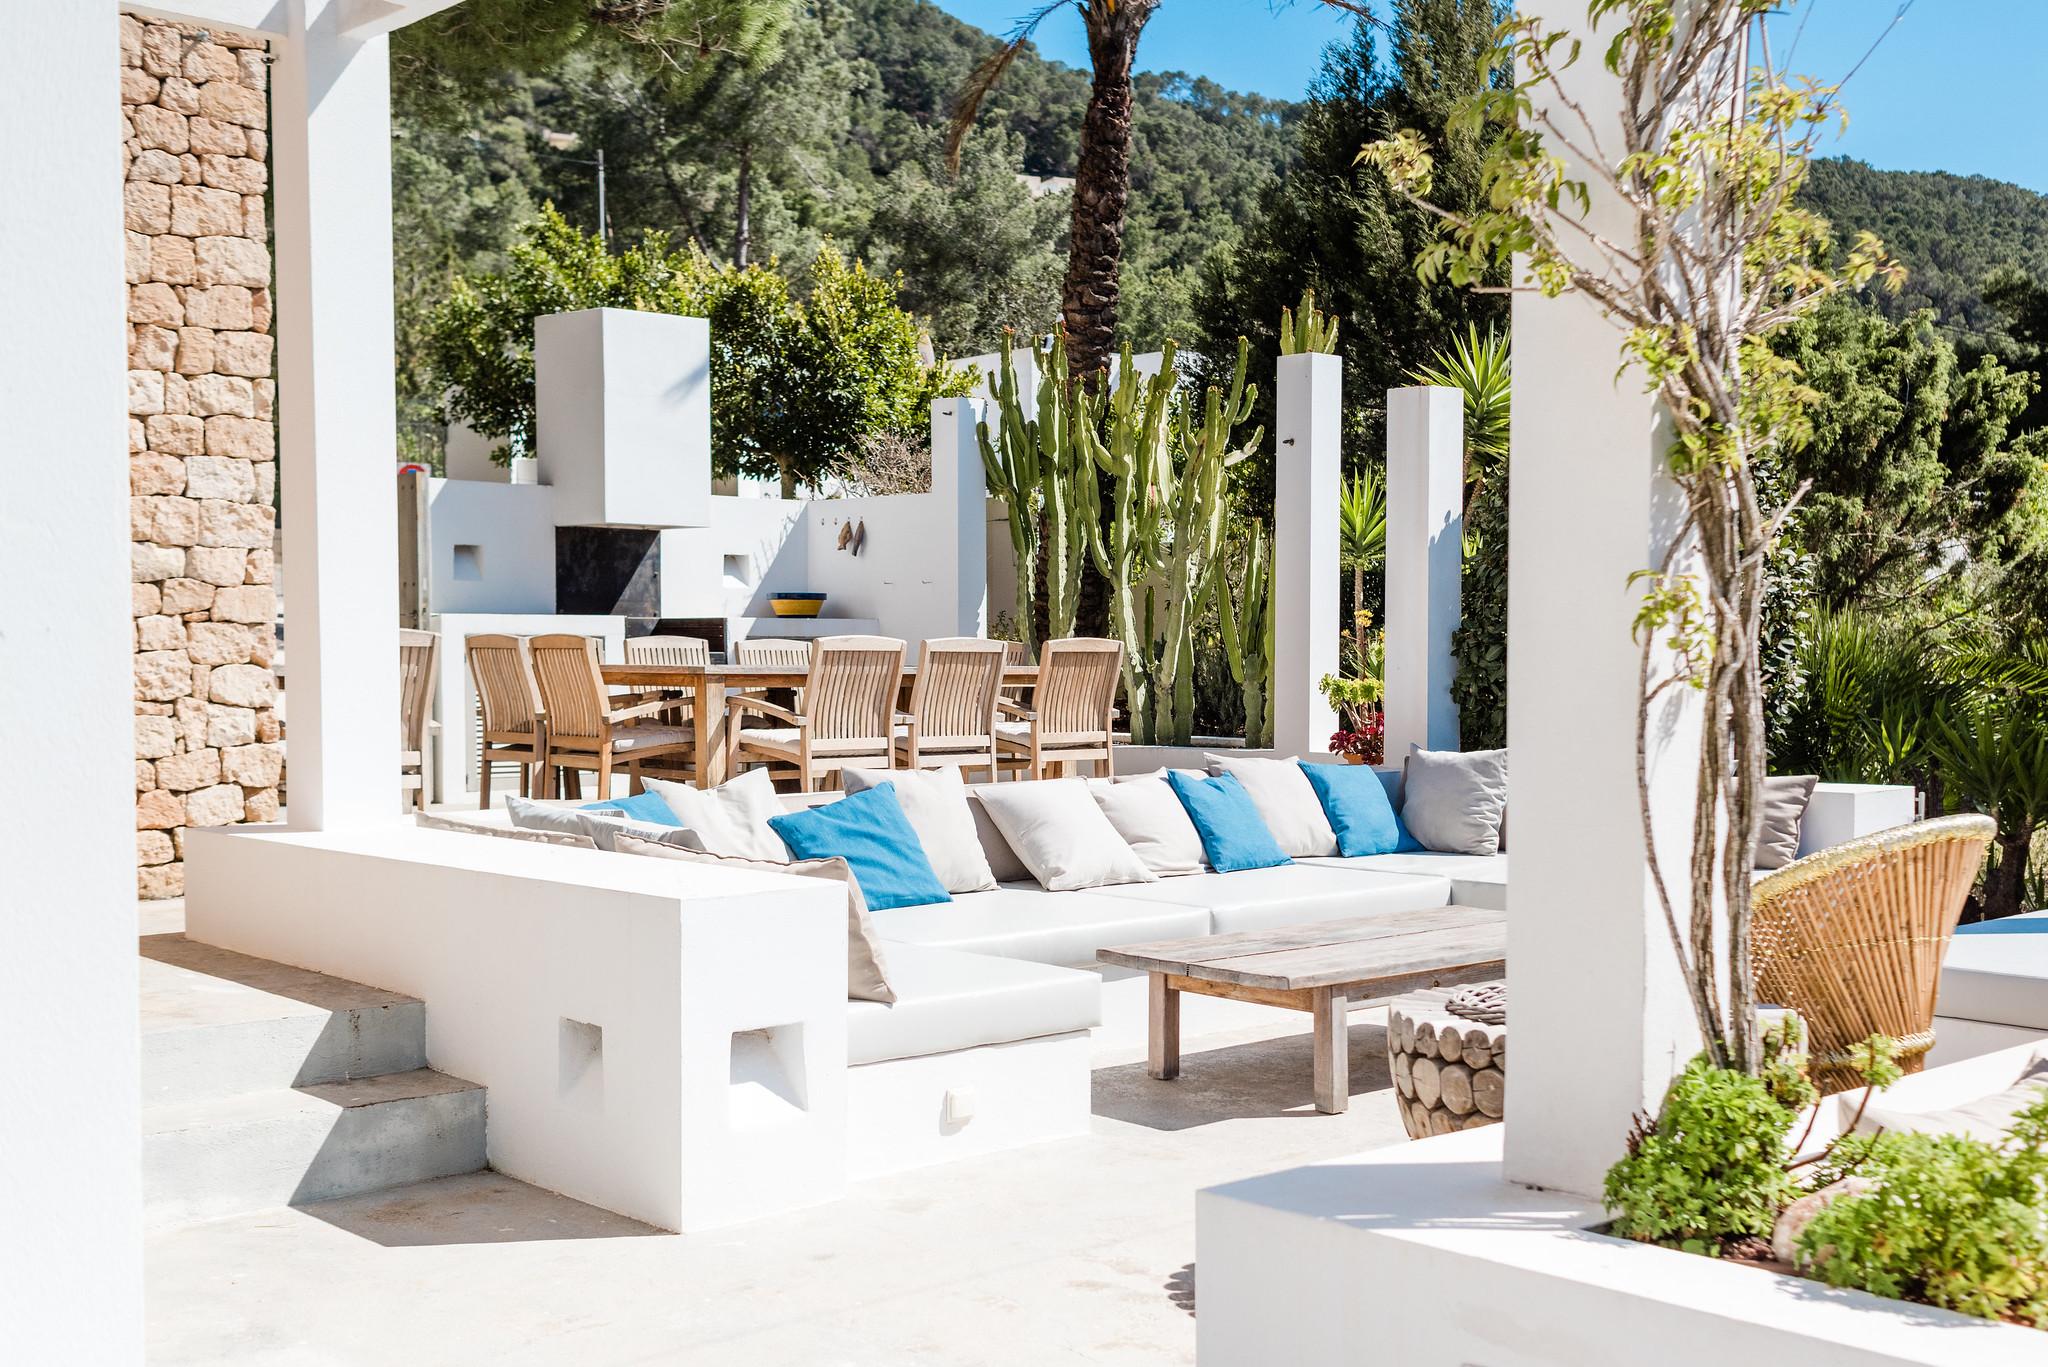 https://www.white-ibiza.com/wp-content/uploads/2020/06/white-ibiza-villas-casa-nyah-exterior-seating-area.jpg